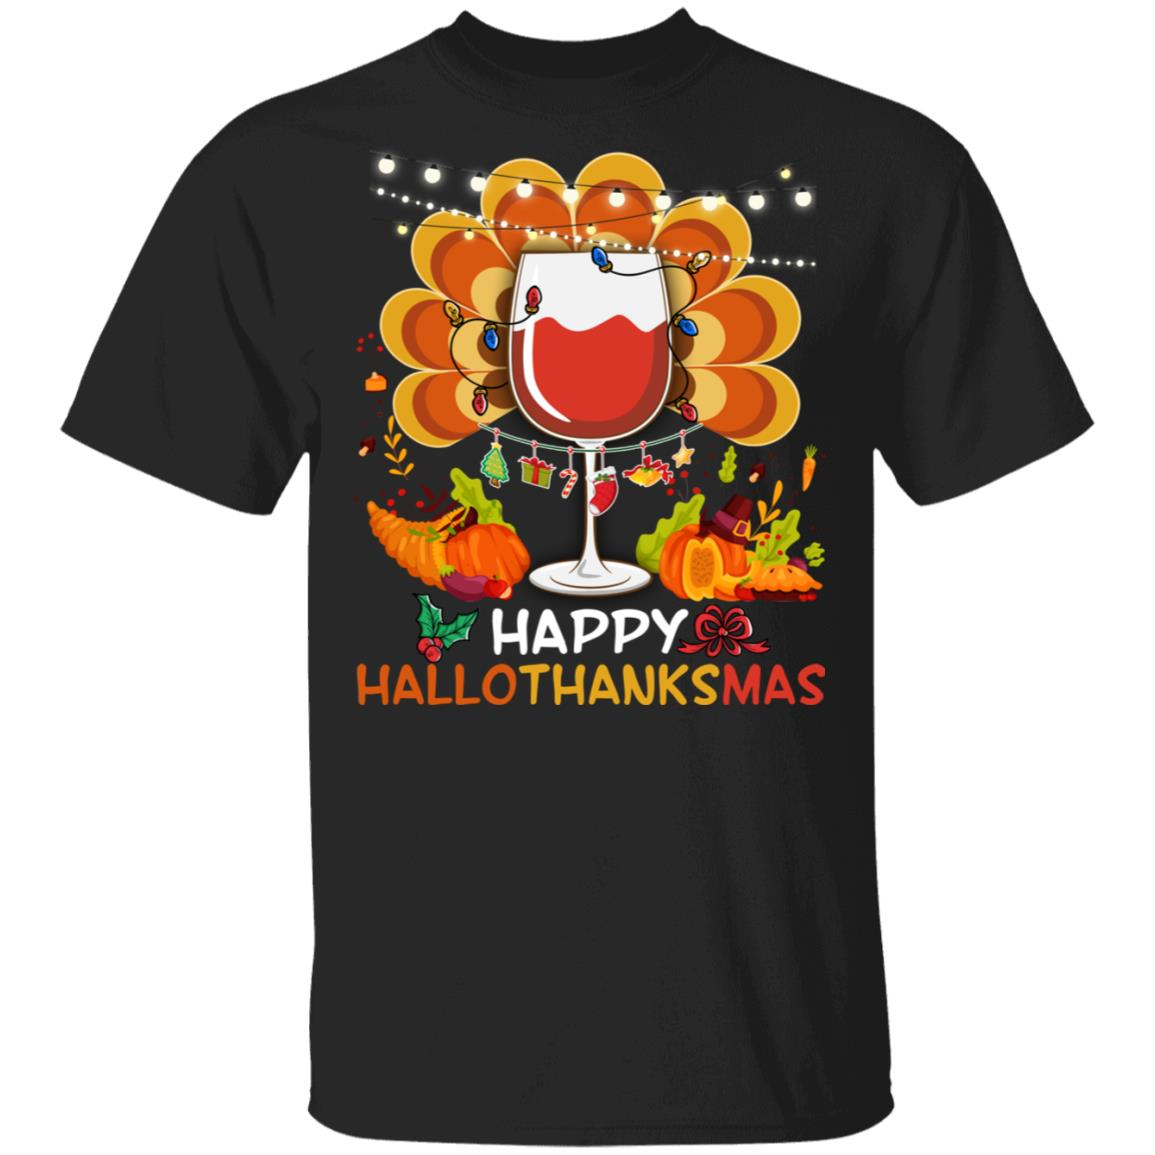 Happy Hallo Thanks Mas T-Shirt Funny Halloween Thanksgiving Christmas Alcohol Drinking Wine T-Shirt Short-Sleeve Unisex T-Shirt